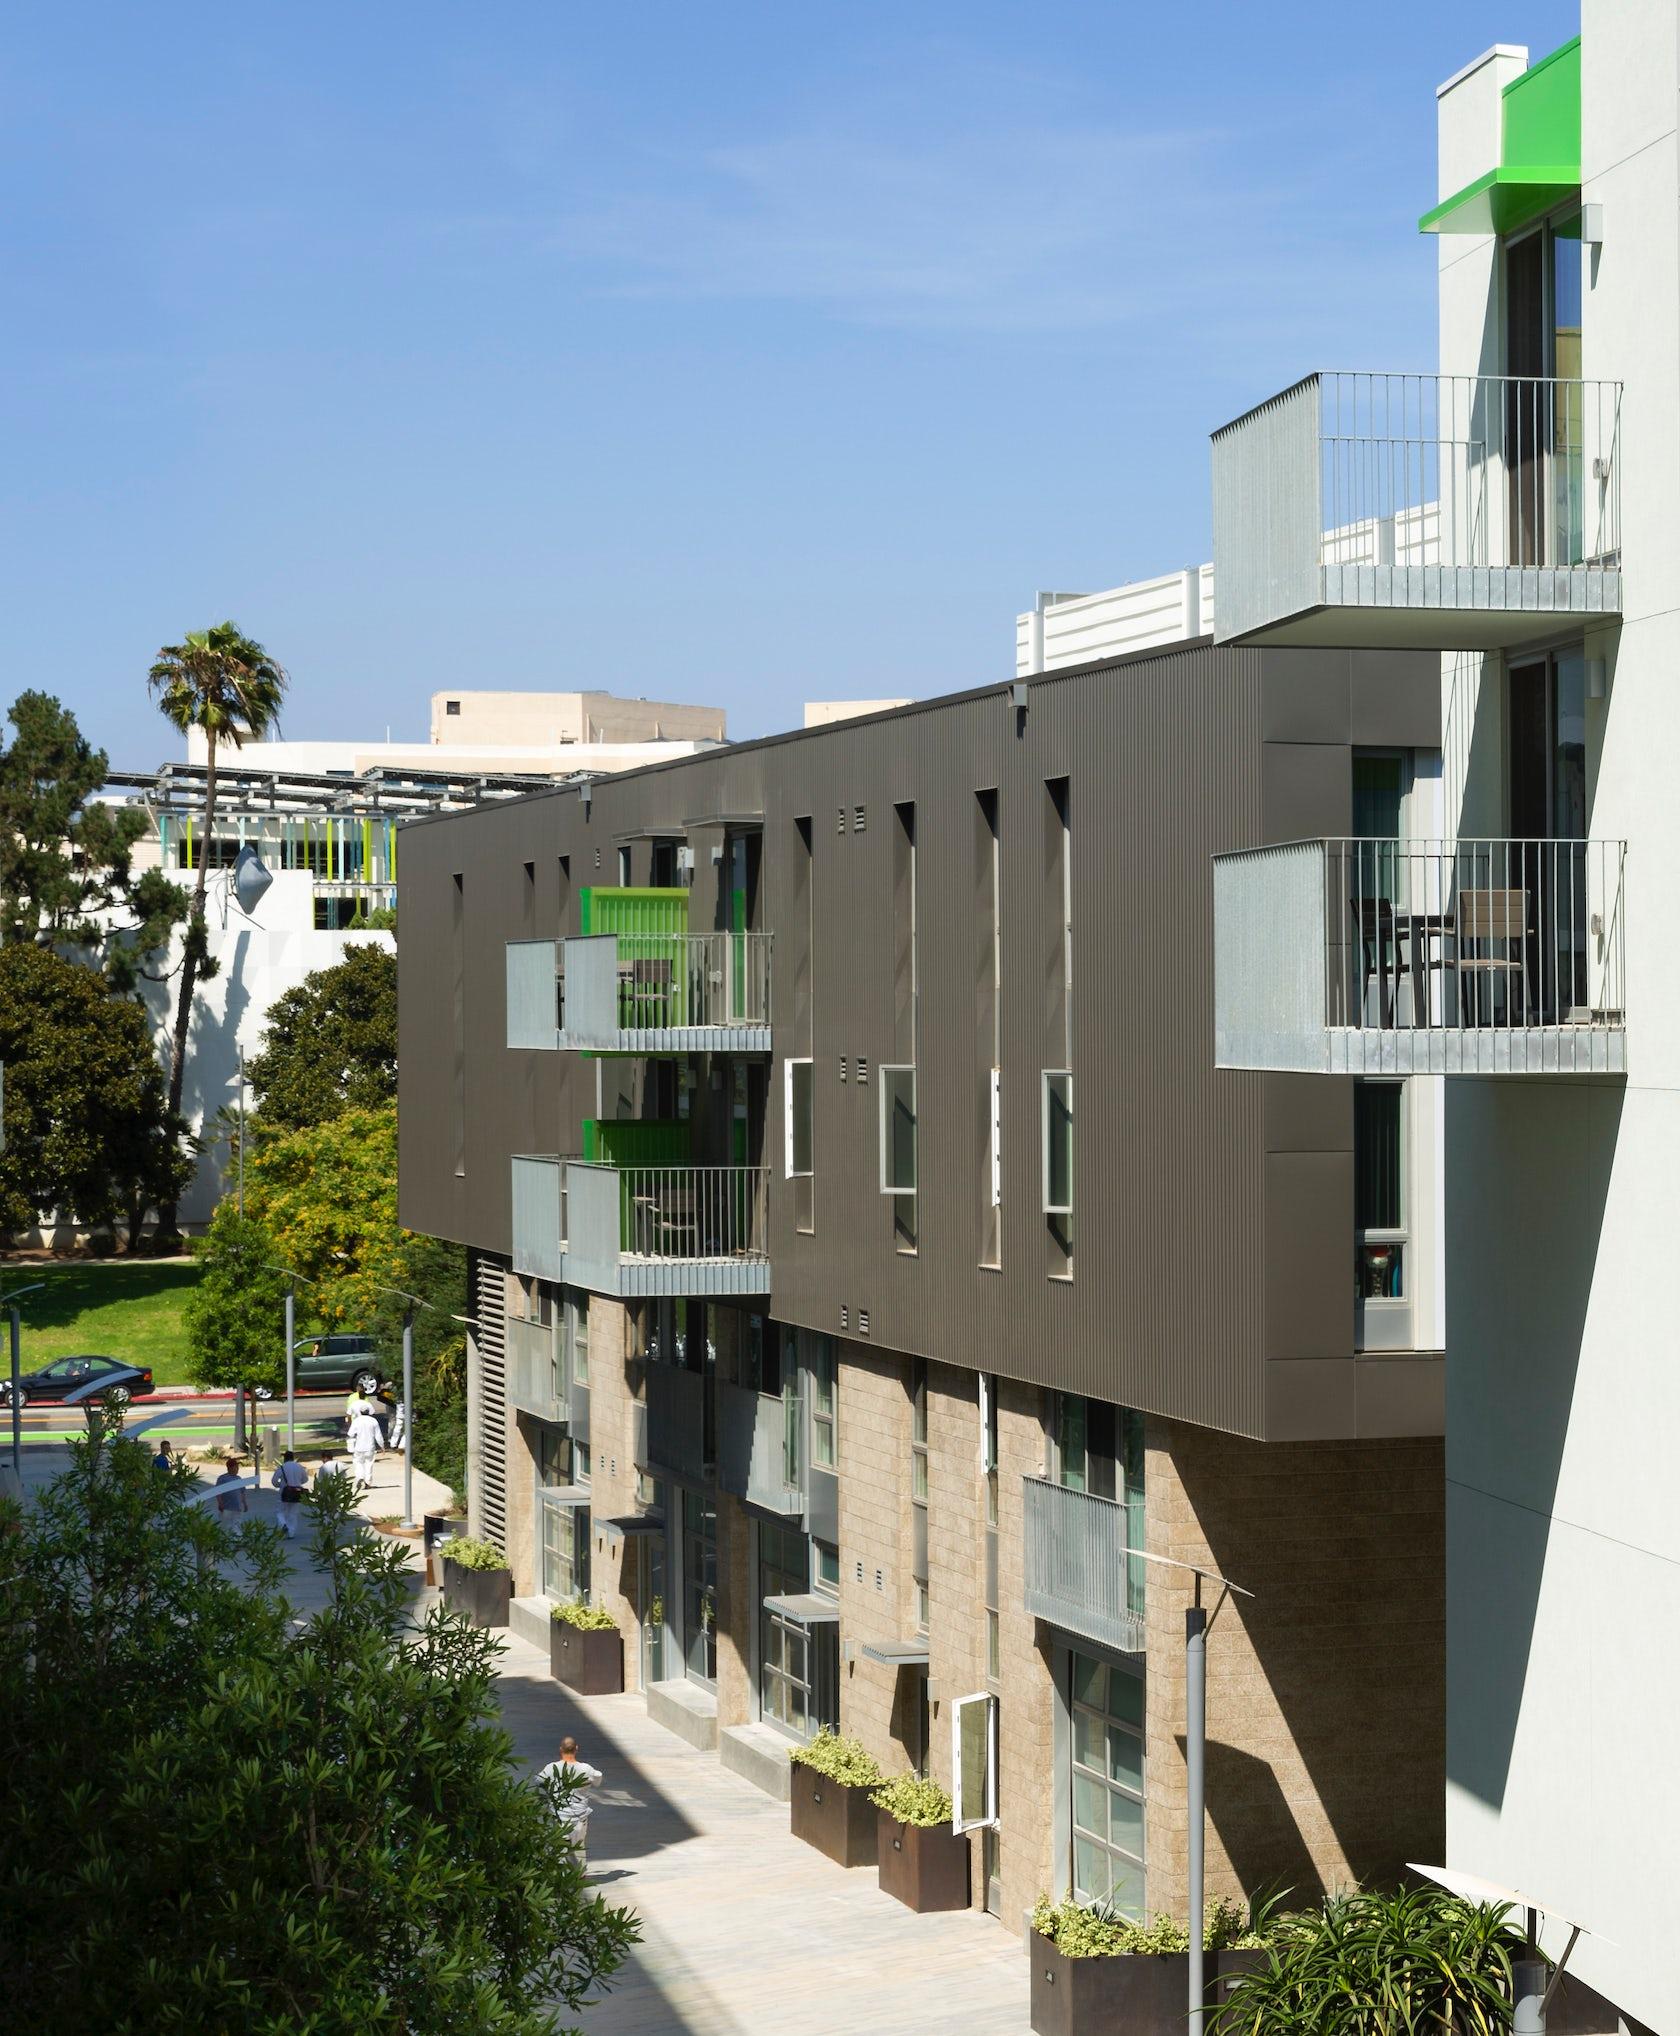 Cheap Apts: Belmar Affordable Apartments